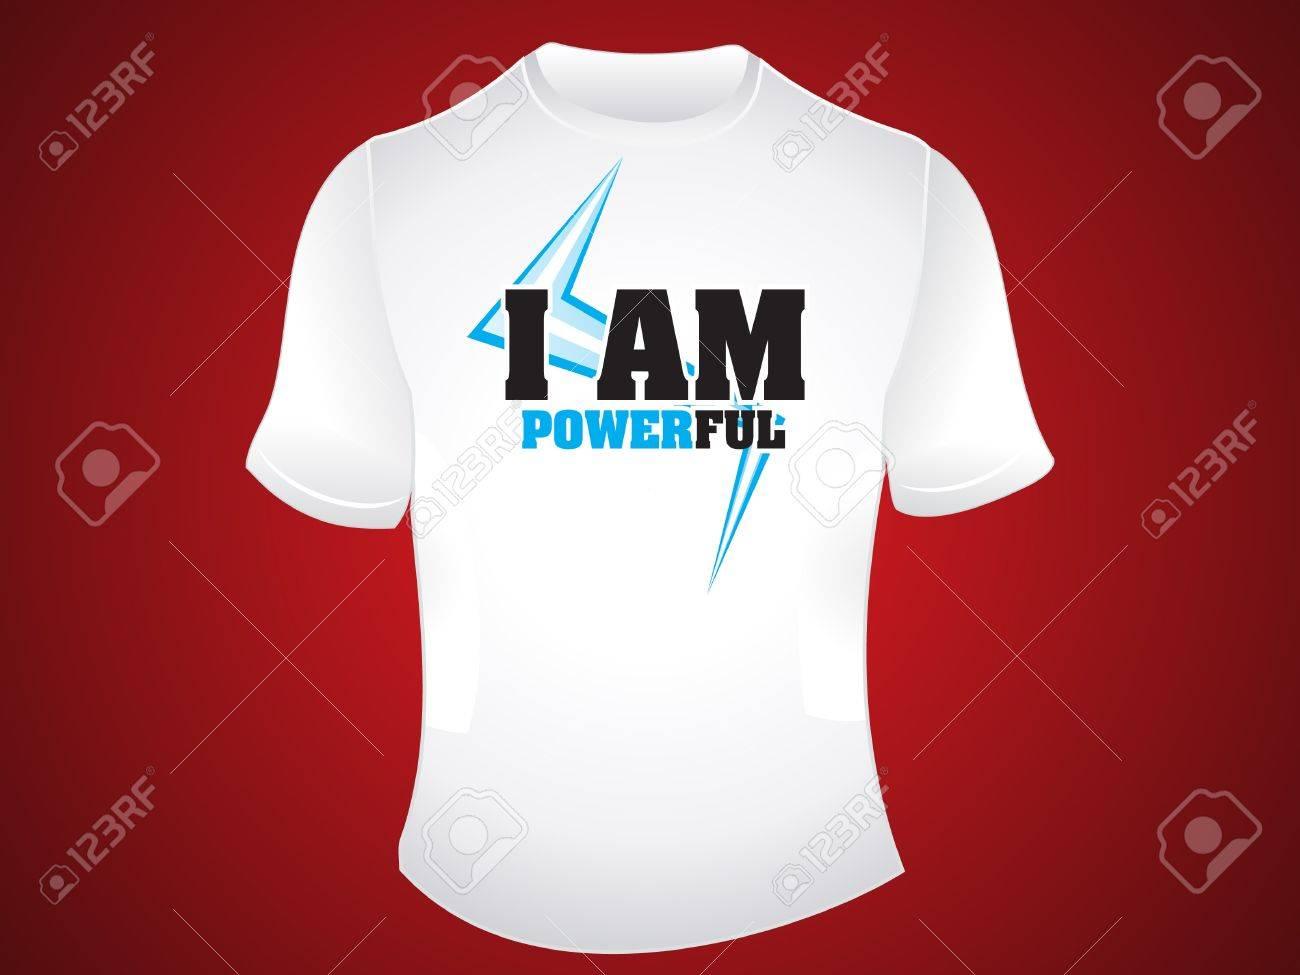 Tshirt design - Vector I Am Powerful Tshirt Design Vector Illustration